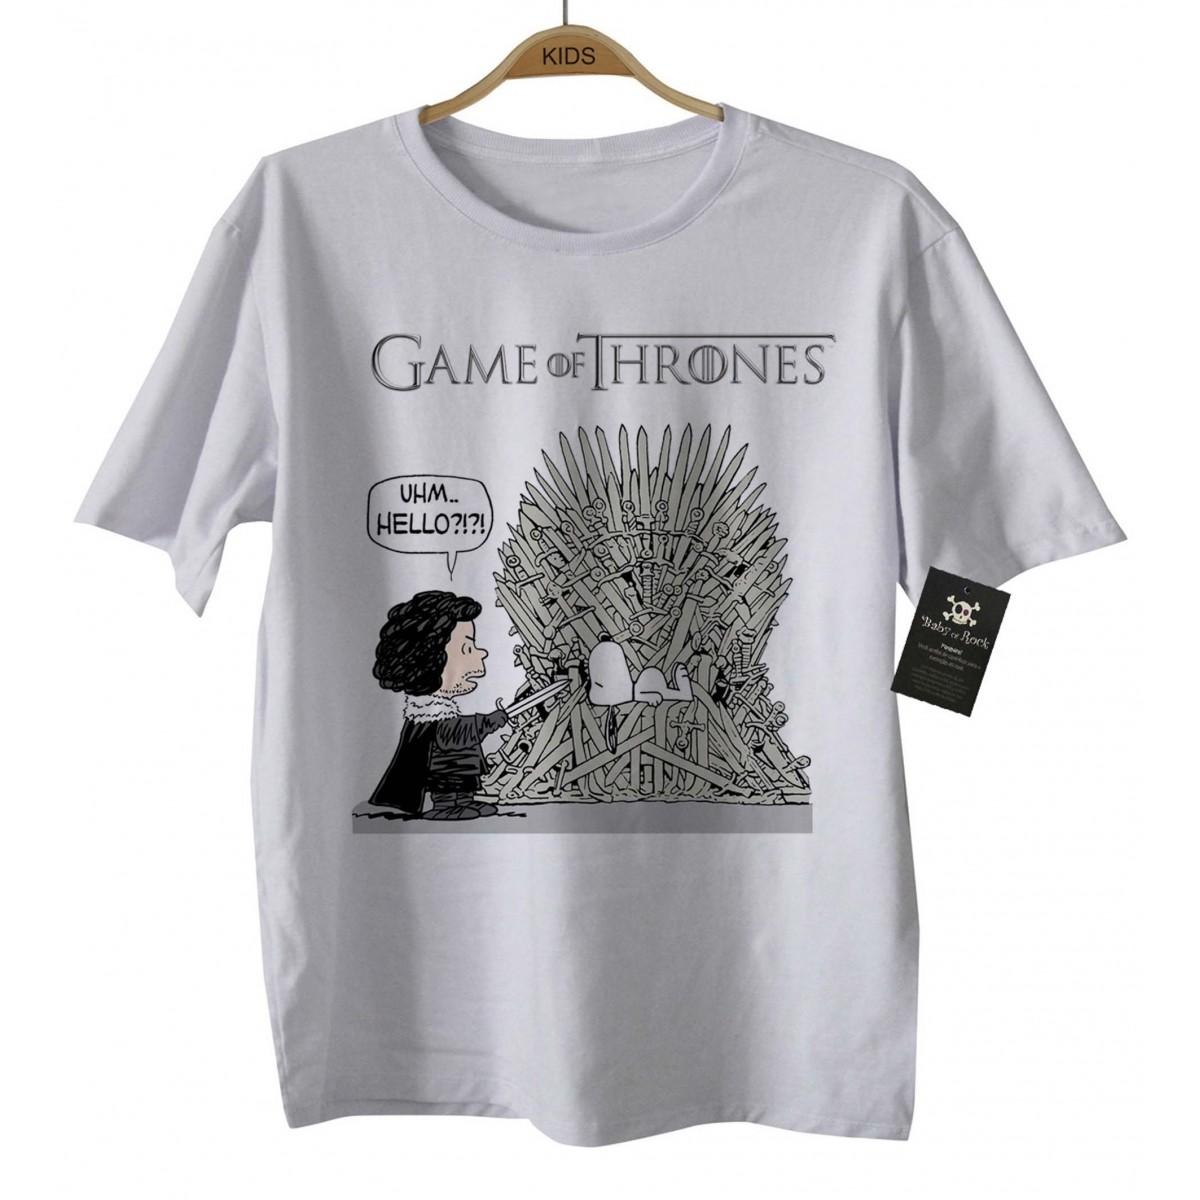 Camiseta de Filme - Infantil - Game of Thrones/Snoop - White  - Baby Monster S/A